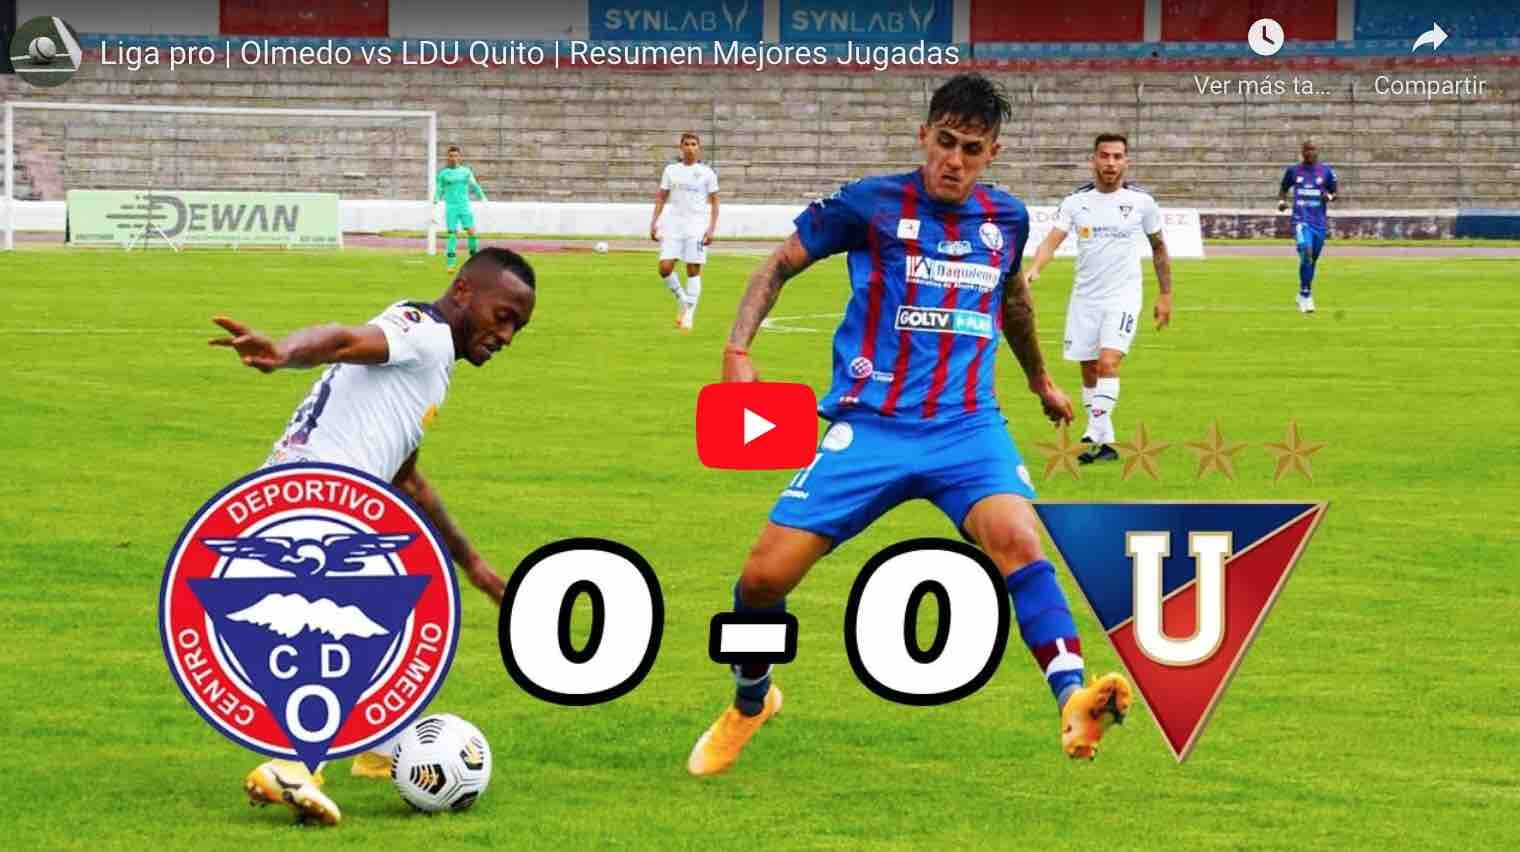 VIDEO: Olmedo vs LDU Quito | Resumen Mejores Jugadas